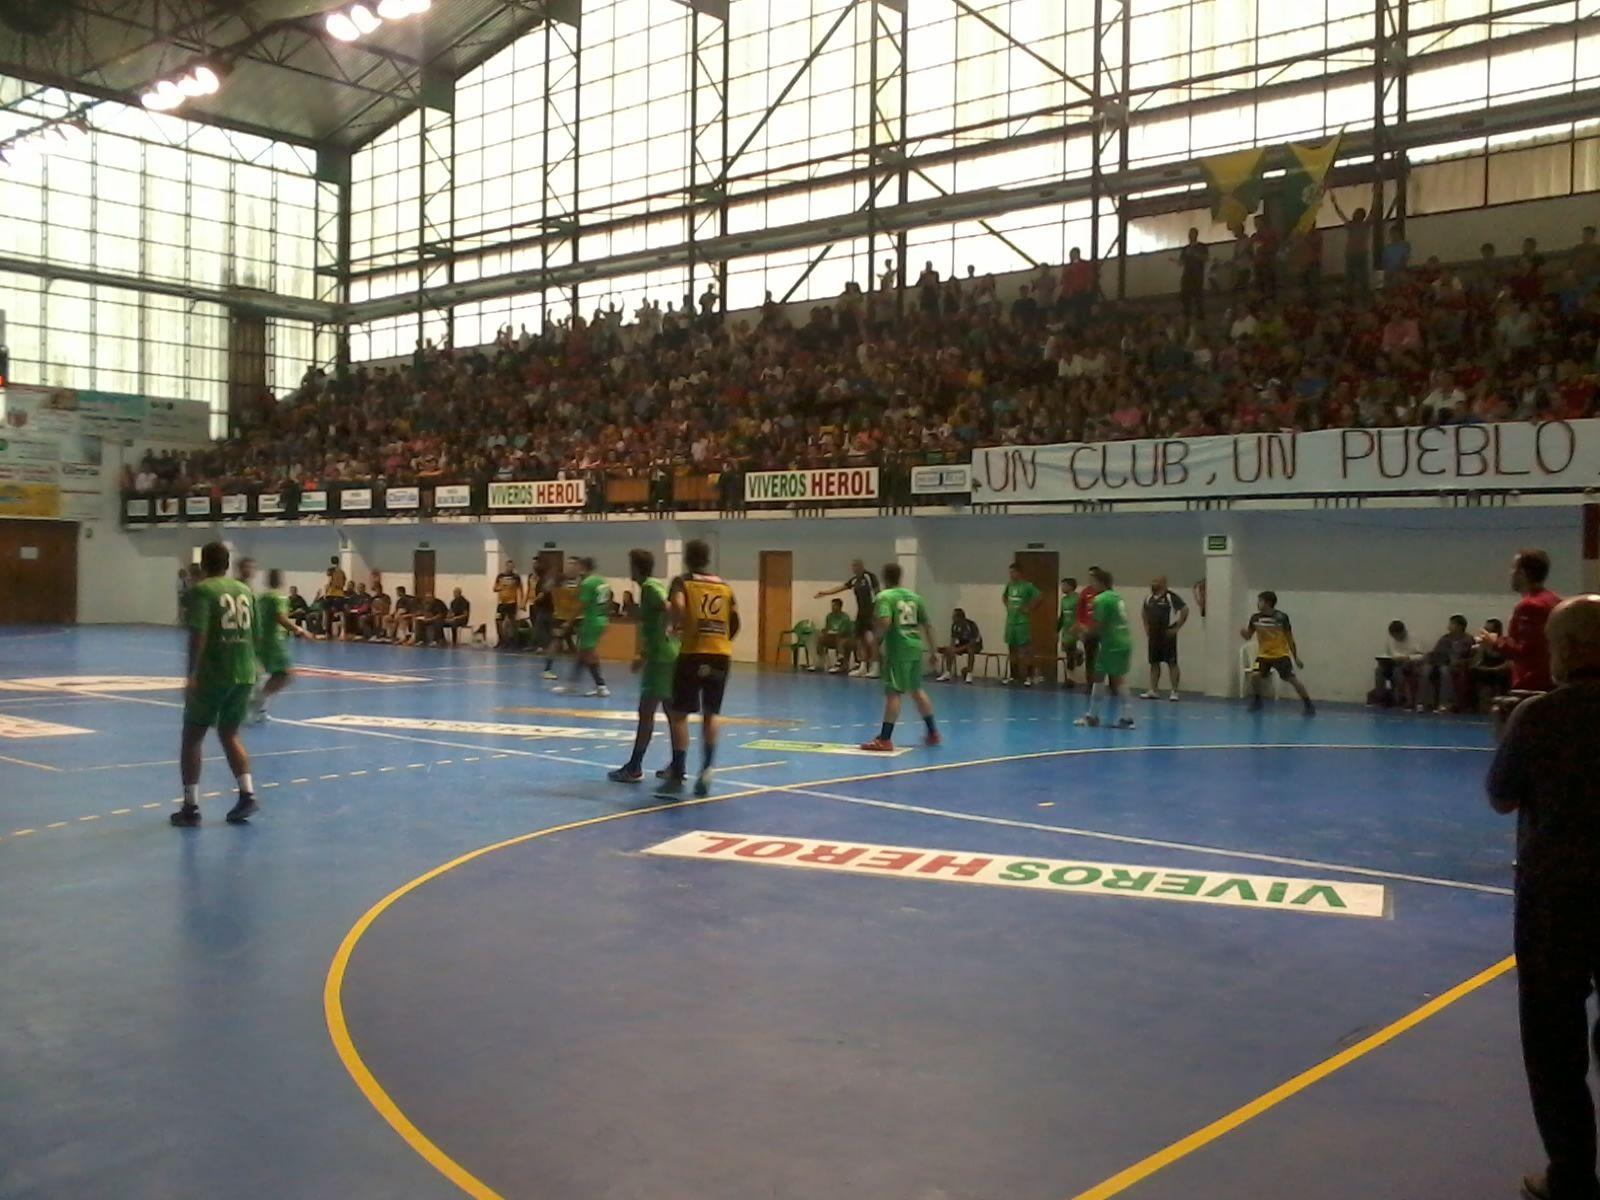 2014-10-04  BALONMANO NAVA-ANTEQUERA COPA REY 01